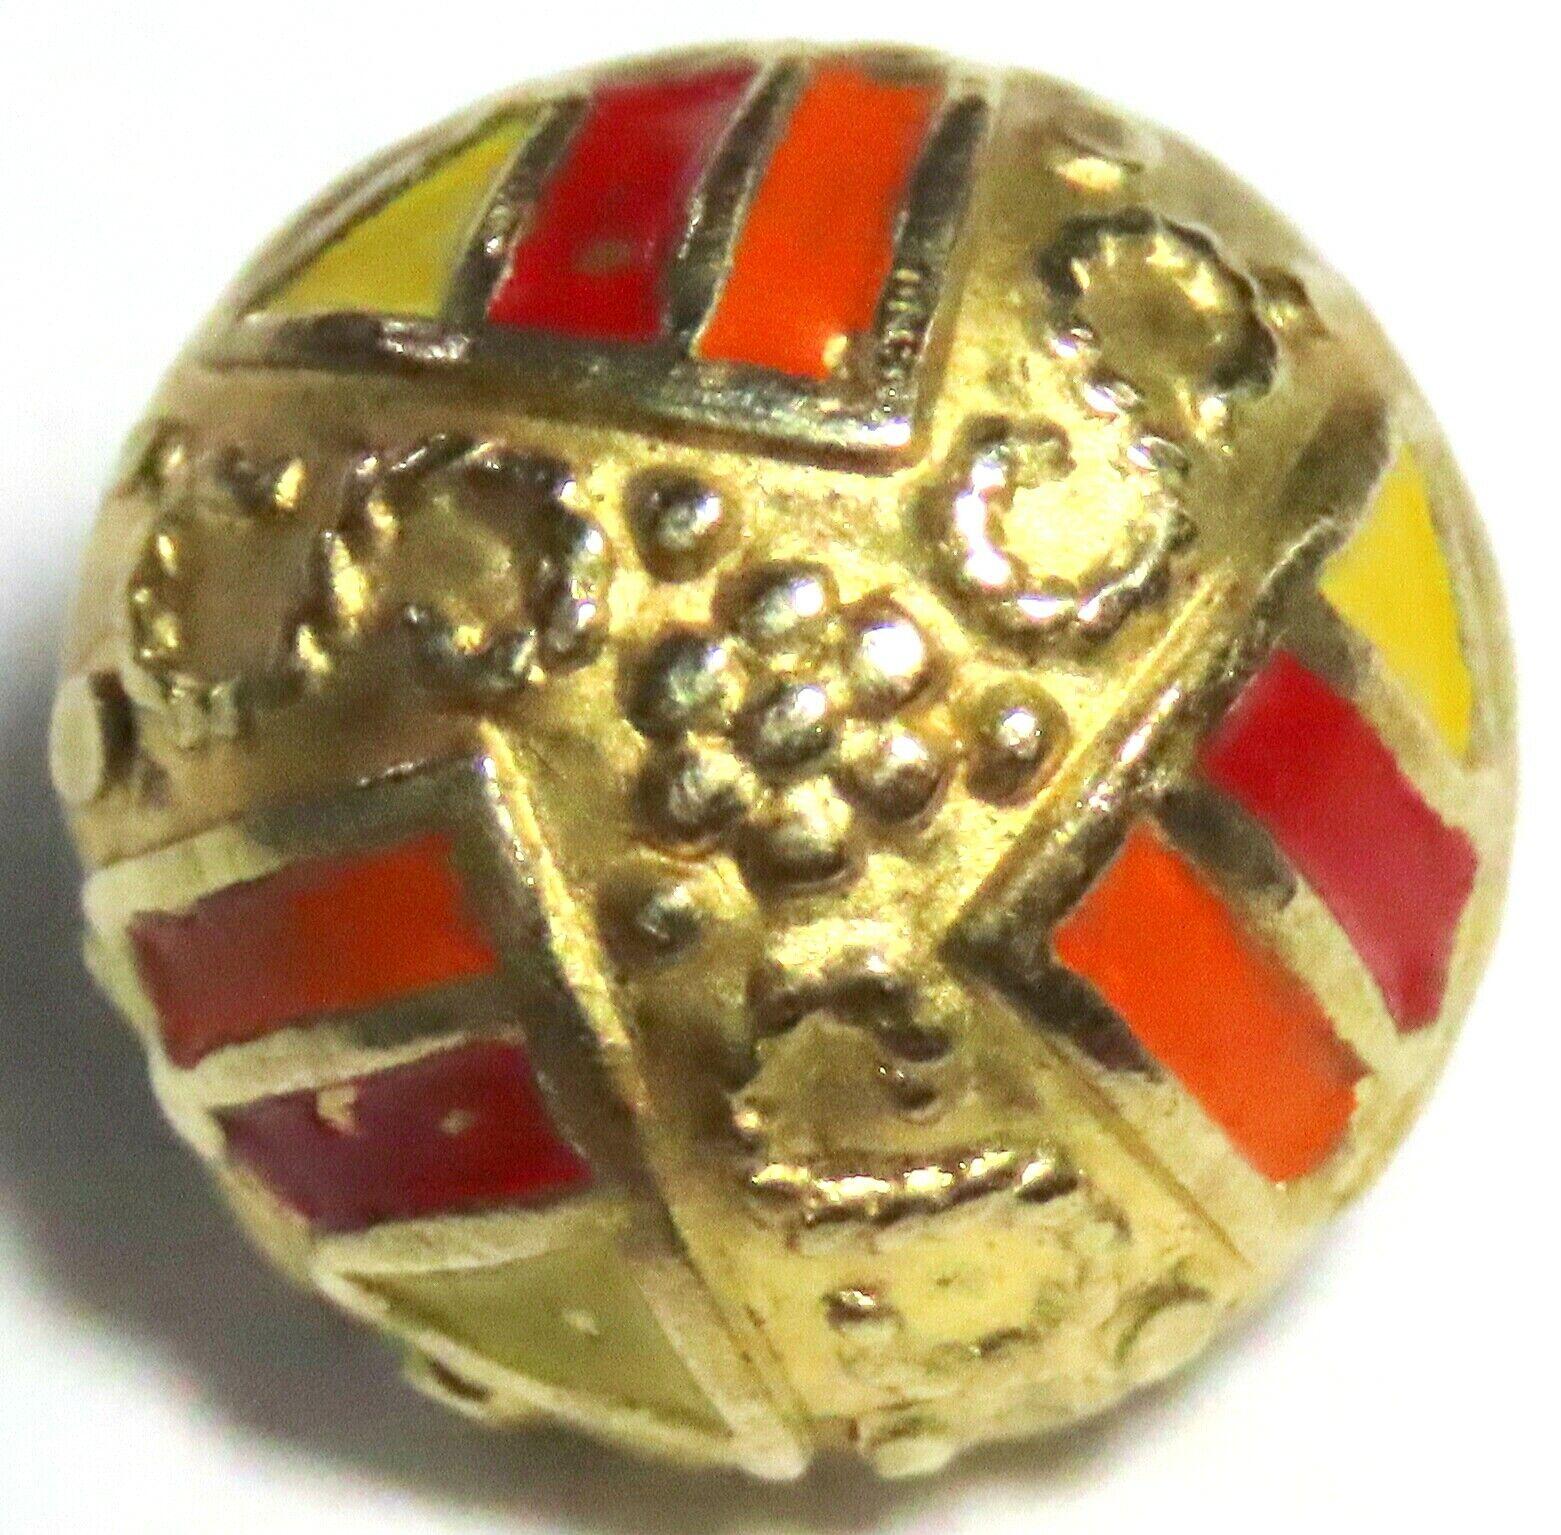 ANTIQUE 1900-1920 S ART DECO GILT BRASS BUTTON W/RED, ORANGE YELLOW ENAMEL - $1.40